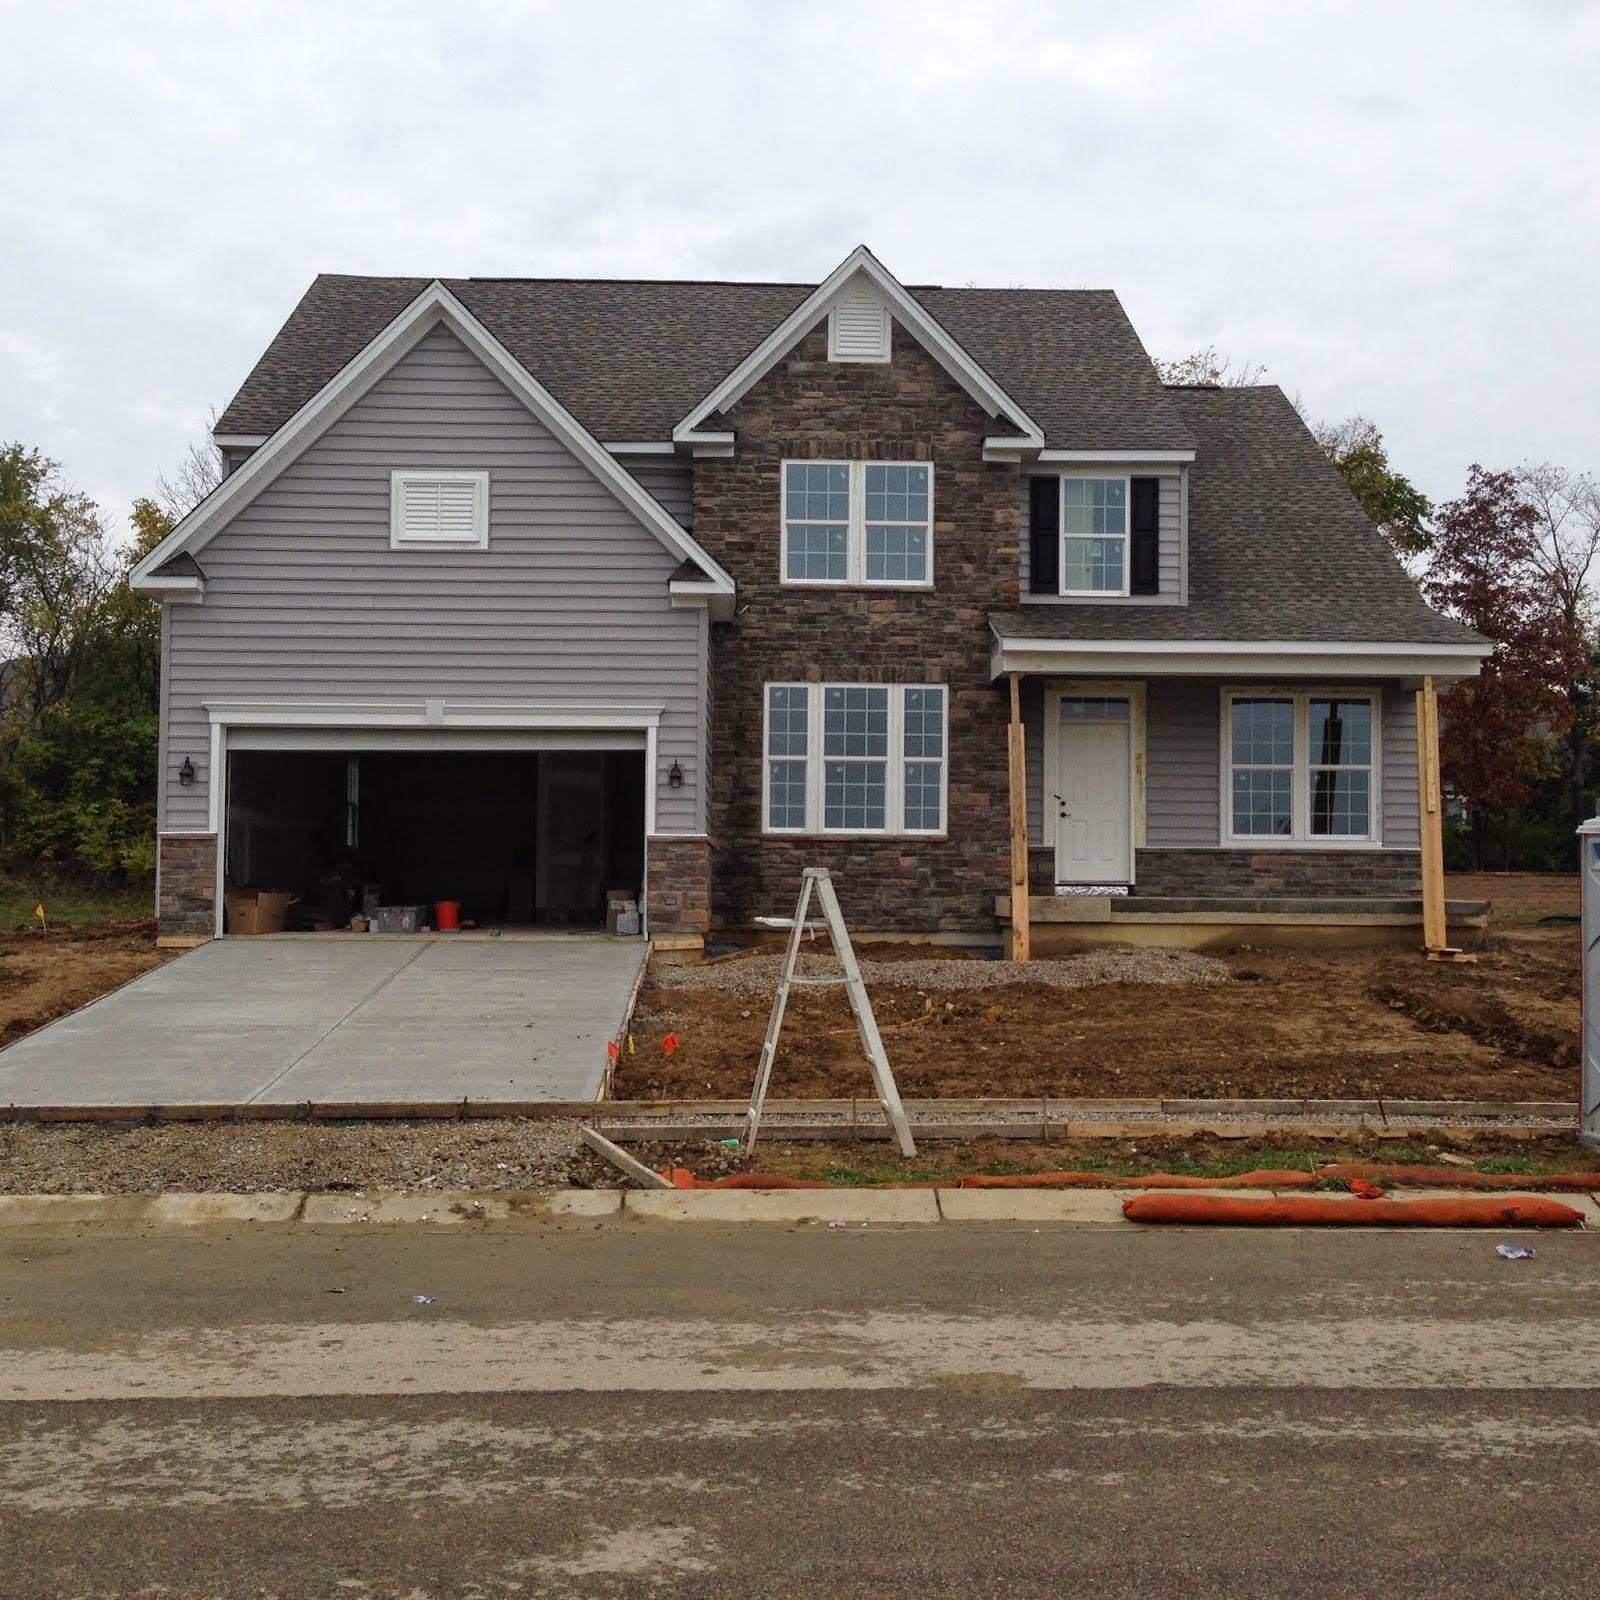 Buildabateman the bateman elevation b exterior for Model home exterior photos